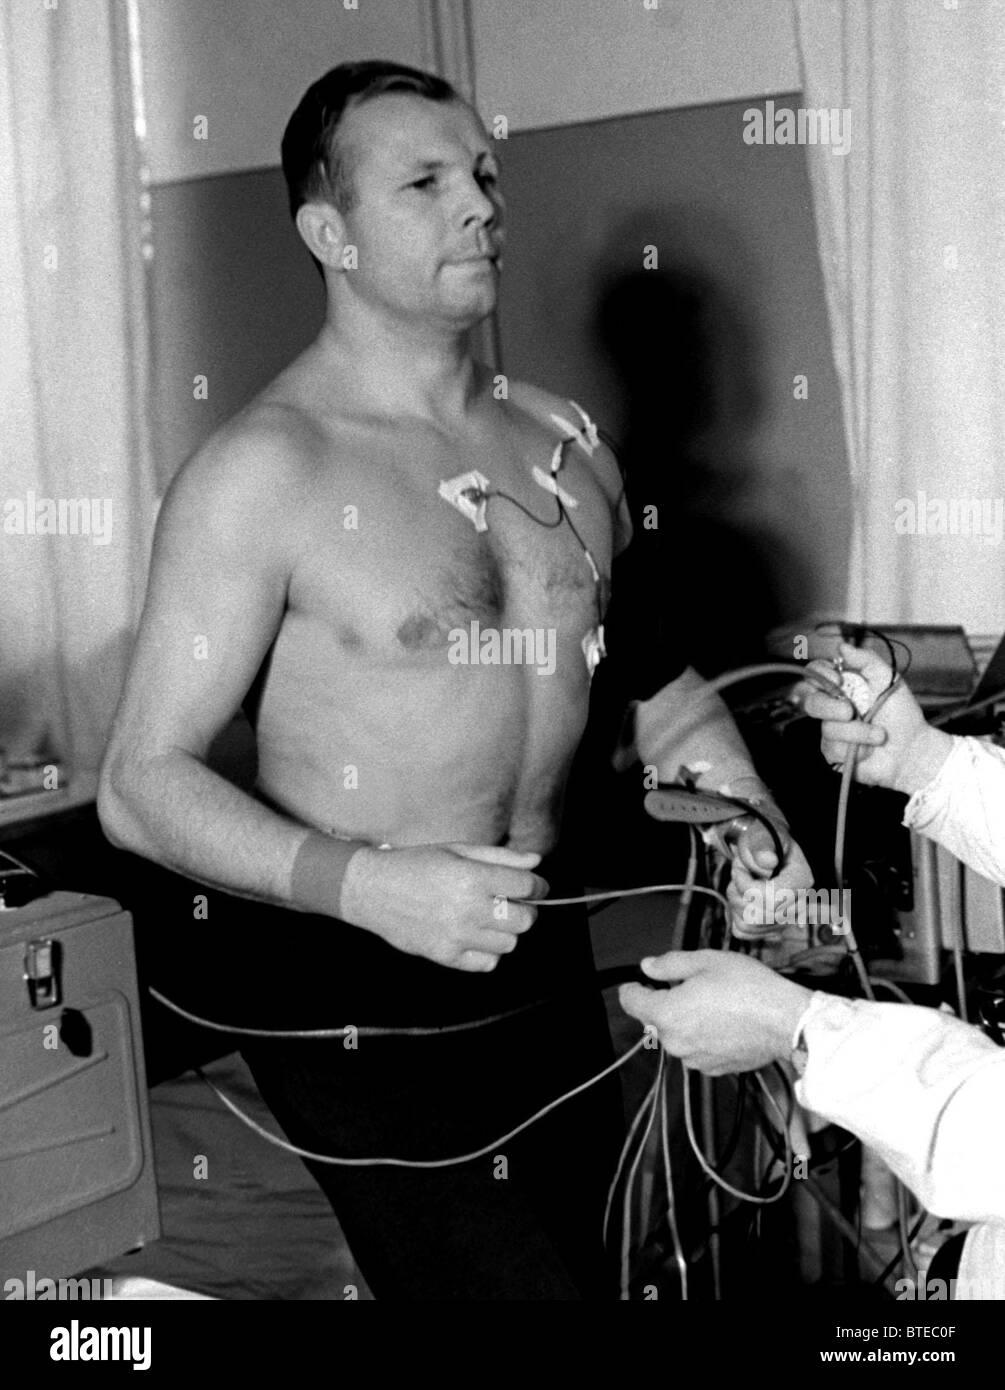 World's first astronaut Yuri Gagarin, 1966 - Stock Image